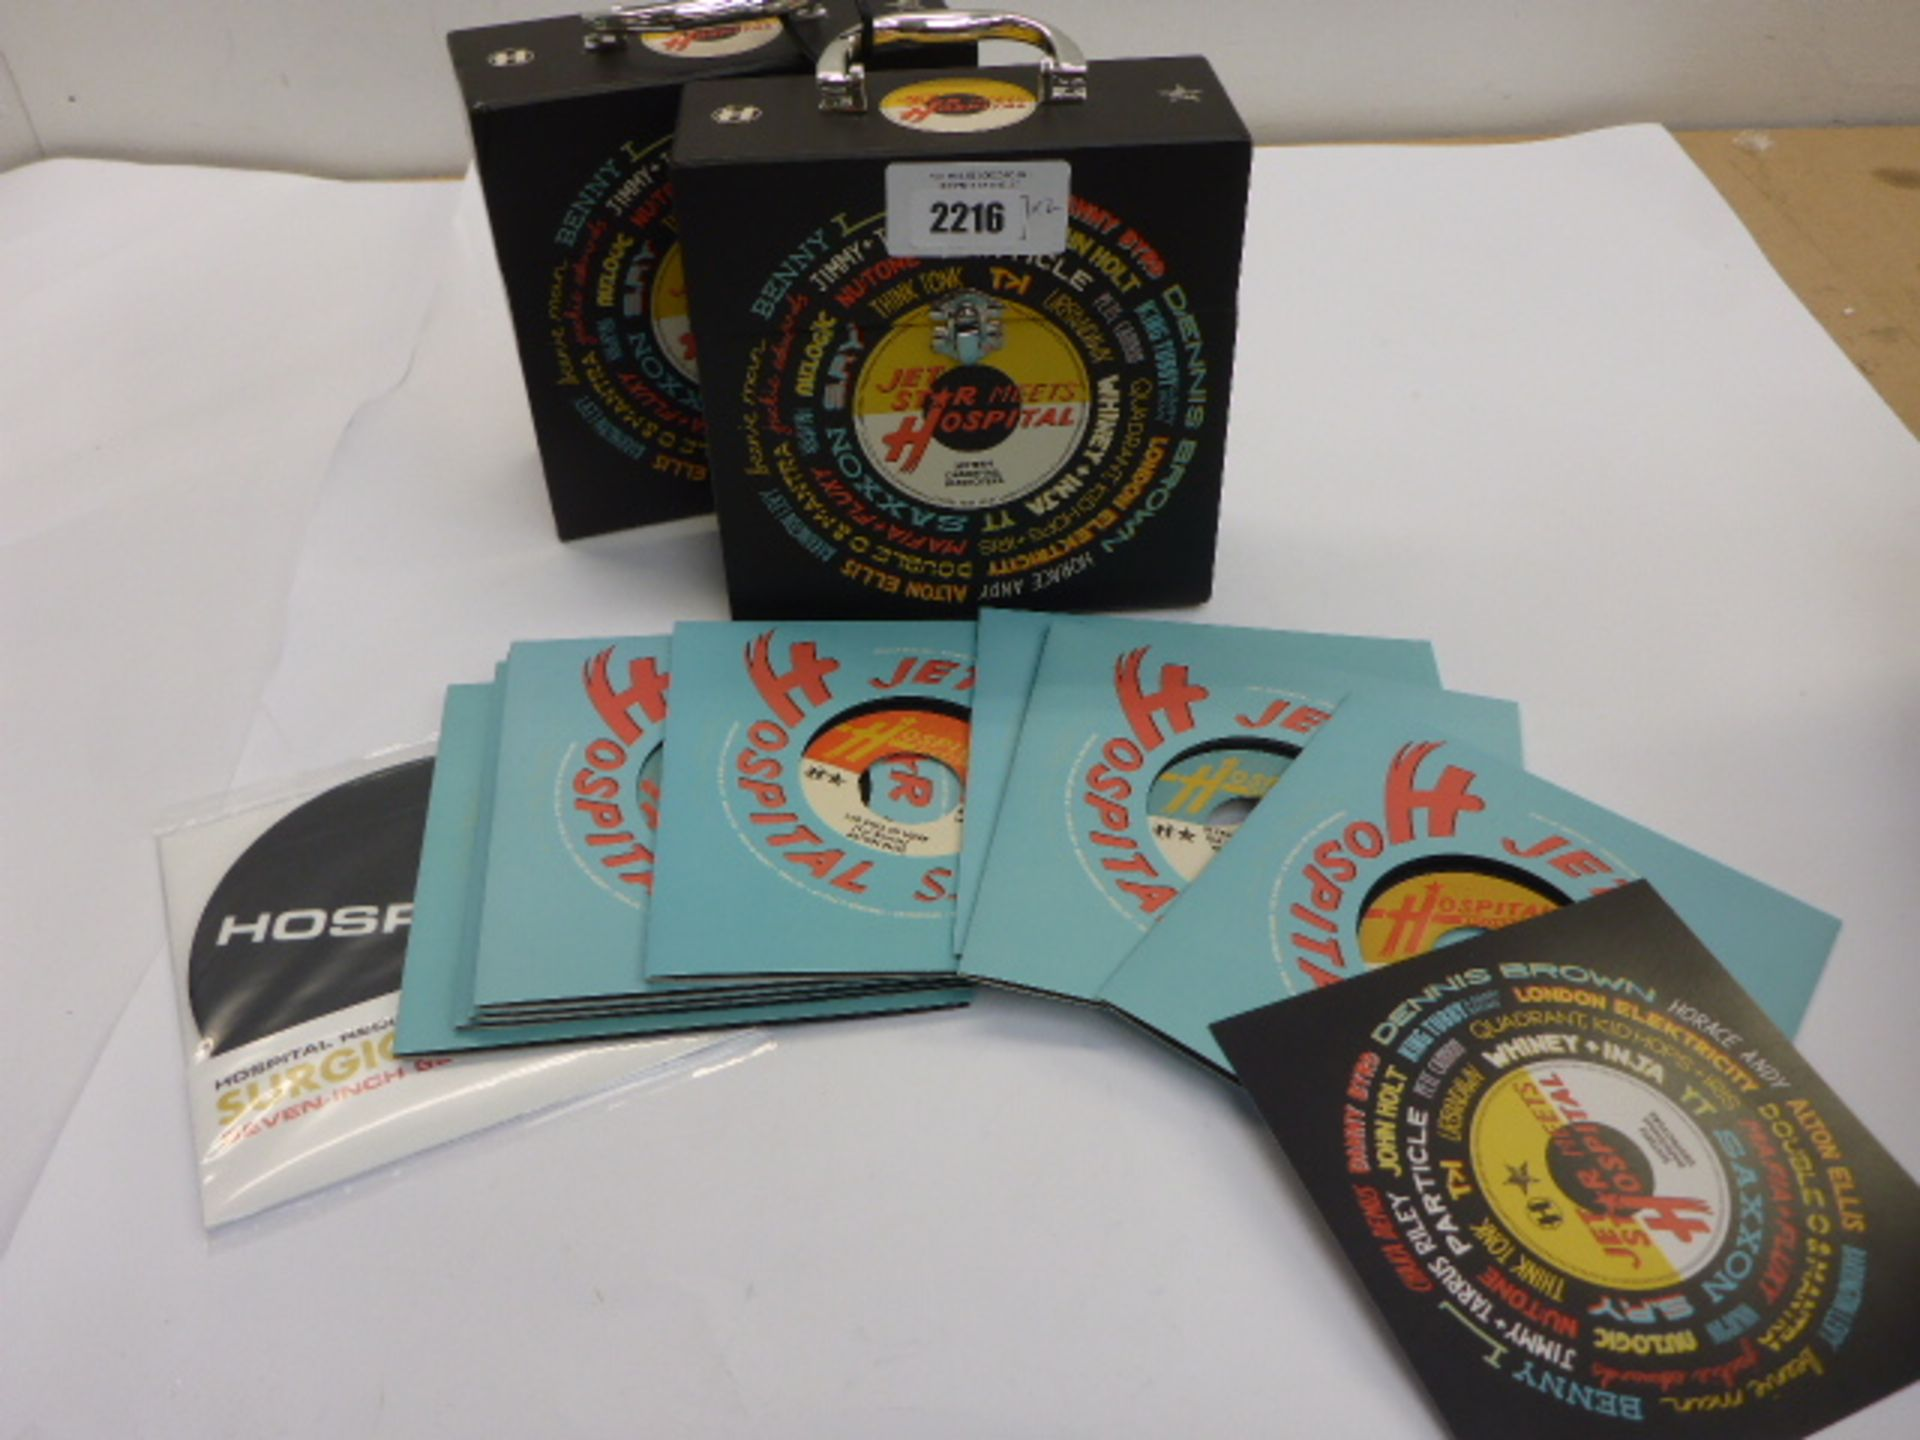 Lotto 2216 - 2x Jet Star Meets Hospital vinyl sets